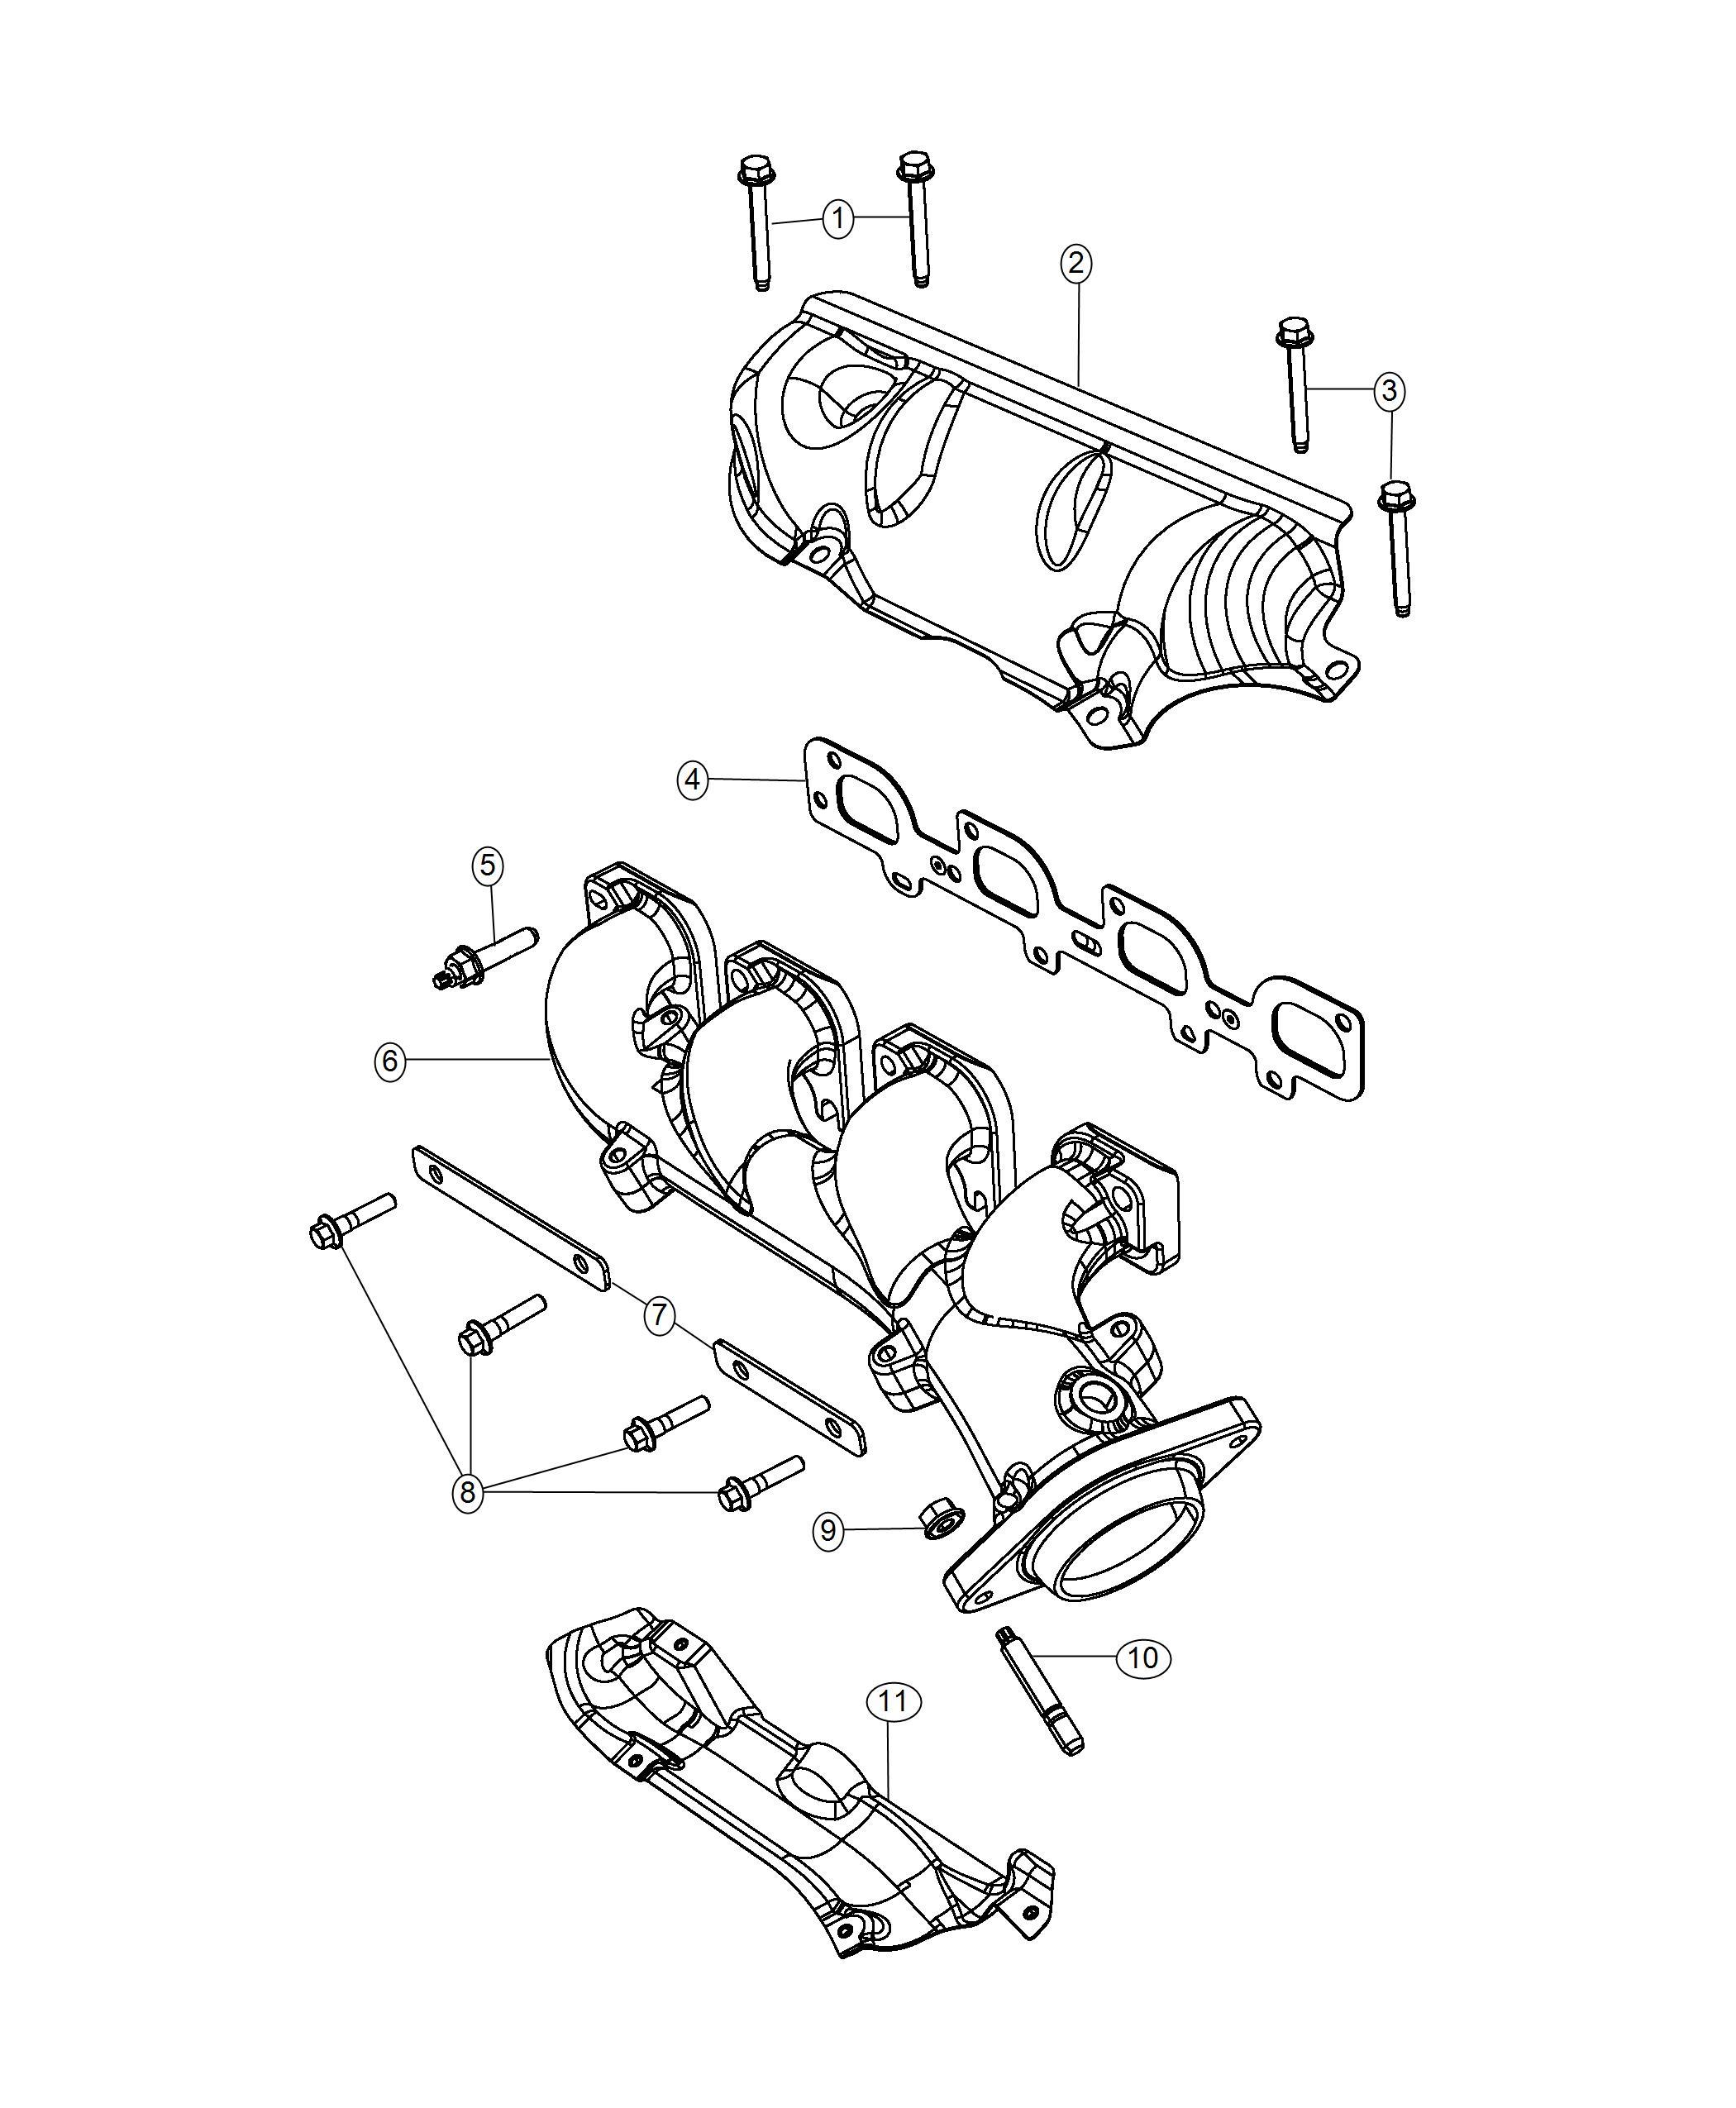 Dodge Durango Manifold Exhaust Right Side Shields Mds